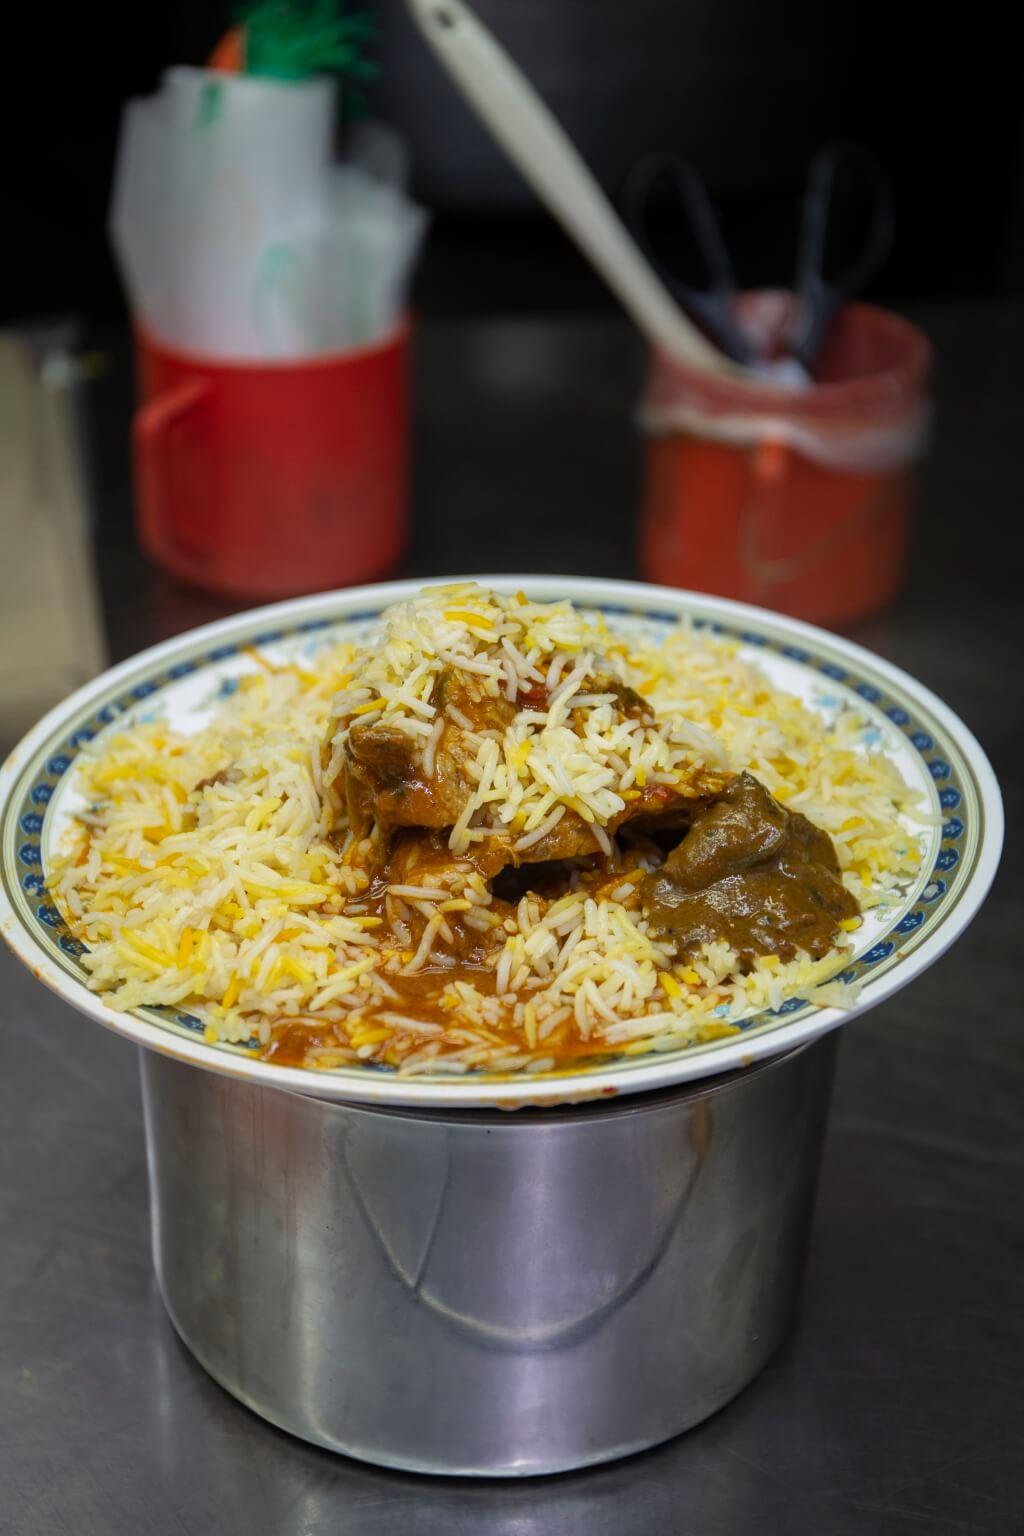 B r i yani Kambing// 即咖喱羊肉香料飯。這裏的特色是 飯和咖喱汁料分開上,讓肉香更突 出。咖喱汁做得又香又清爽。 另有 雞、炸雞及牛可選(SGD $6)。